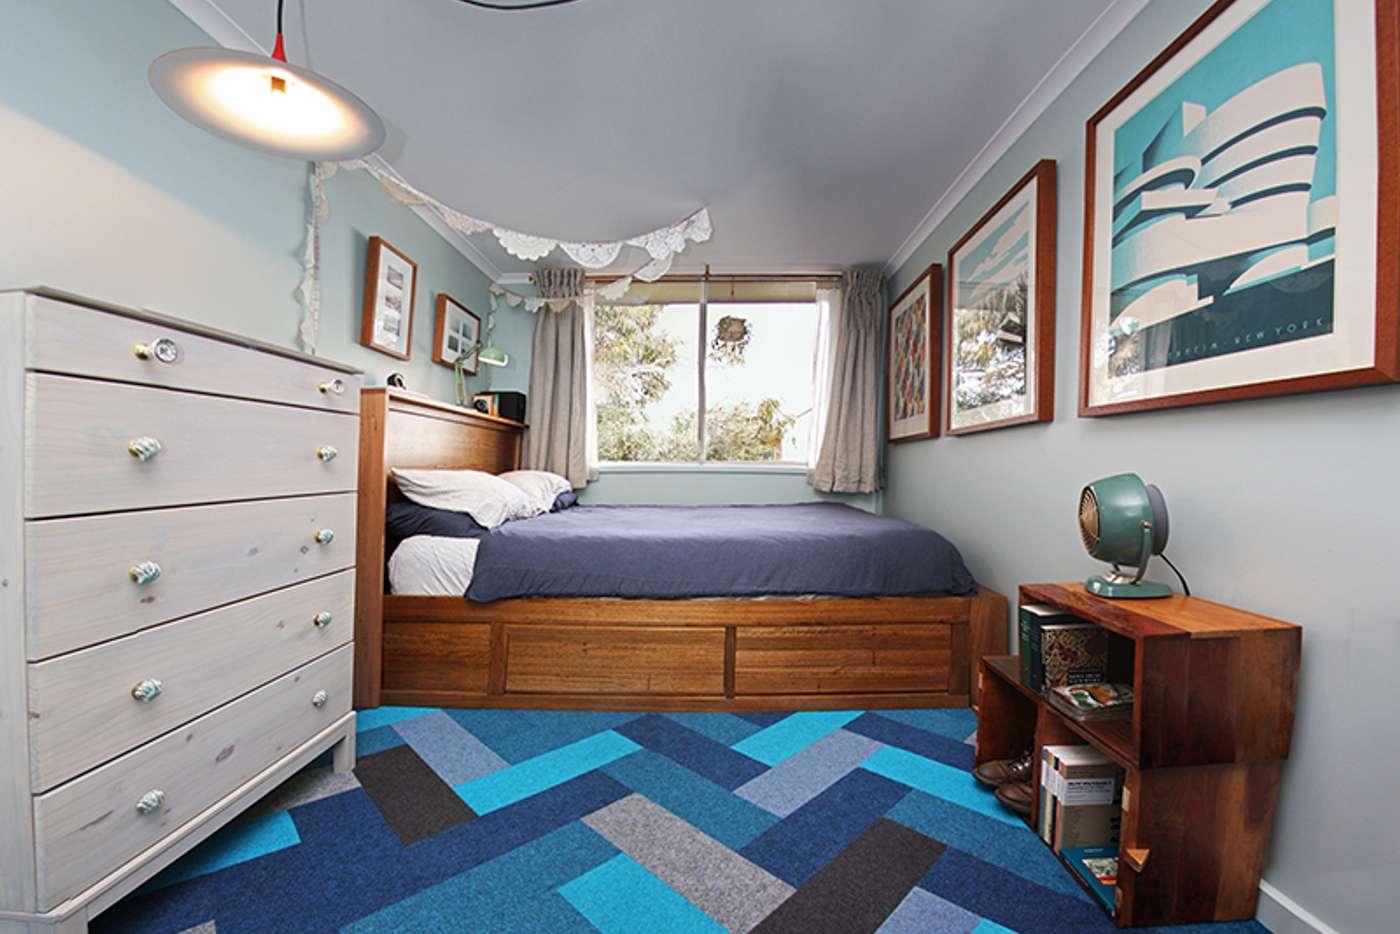 Sixth view of Homely apartment listing, 7/251 Nicholson Street, Seddon VIC 3011